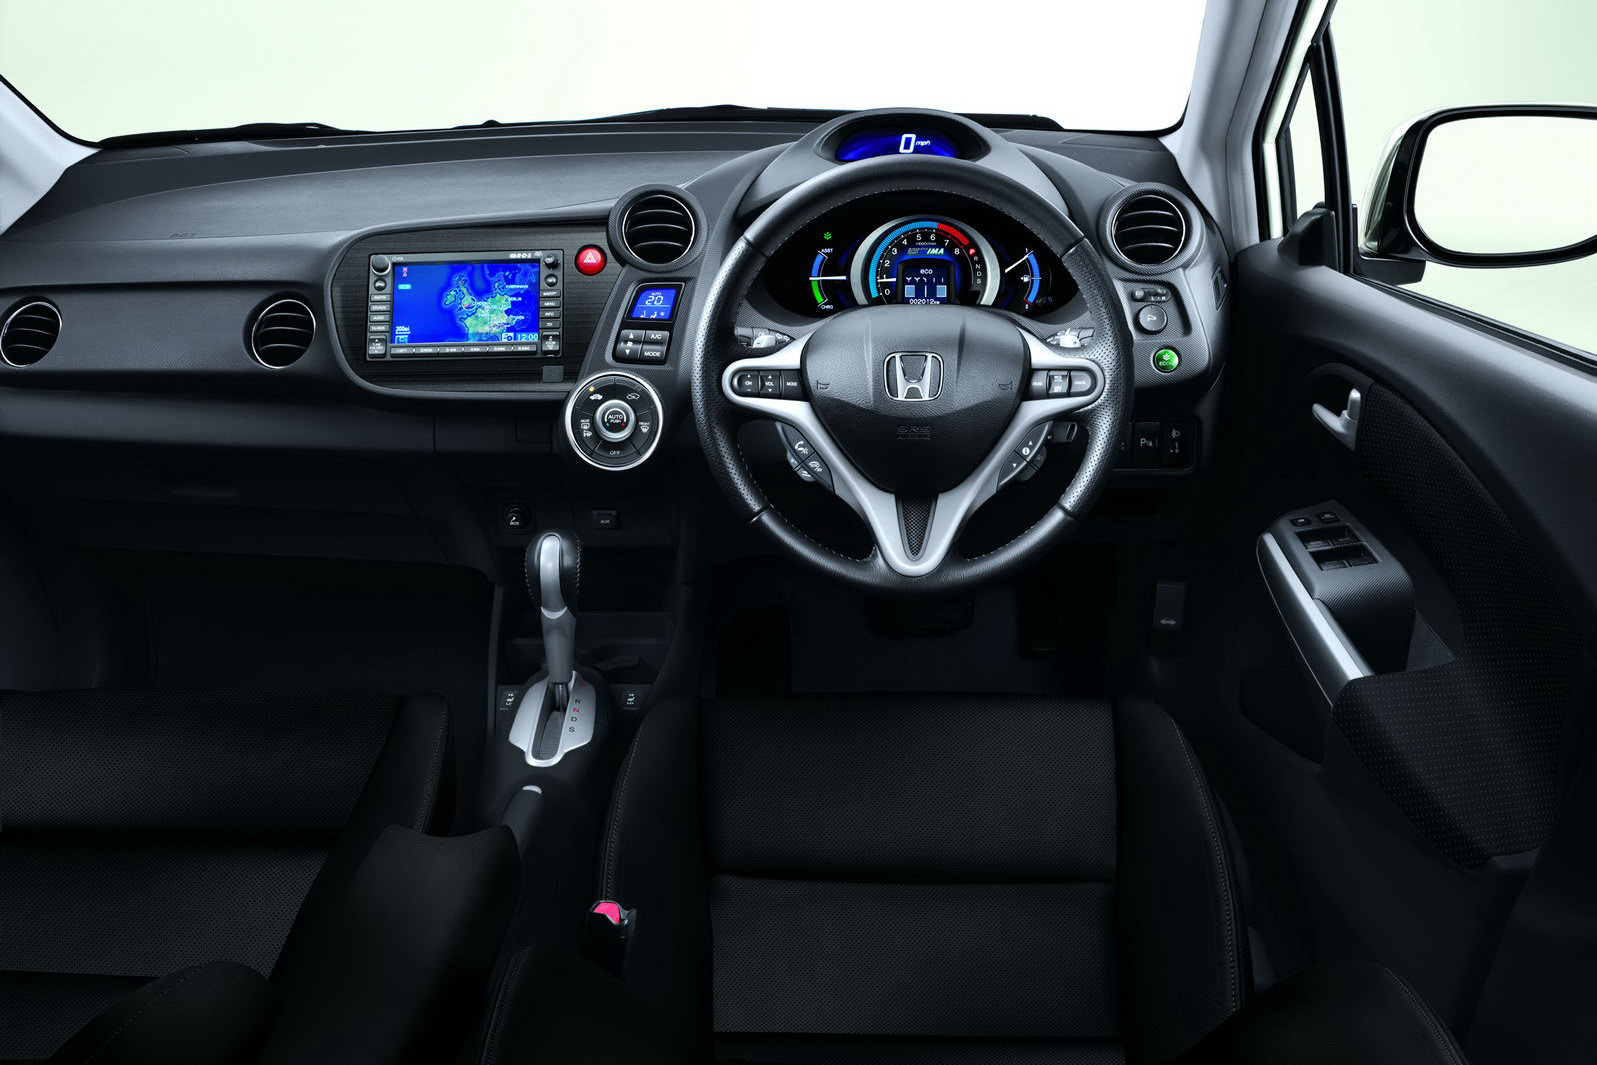 http://1.bp.blogspot.com/_FoXyvaPSnVk/TERTAbiRRMI/AAAAAAADFpM/5c13KZNzrYk/s1600/2011-Honda-Insight-3.jpg